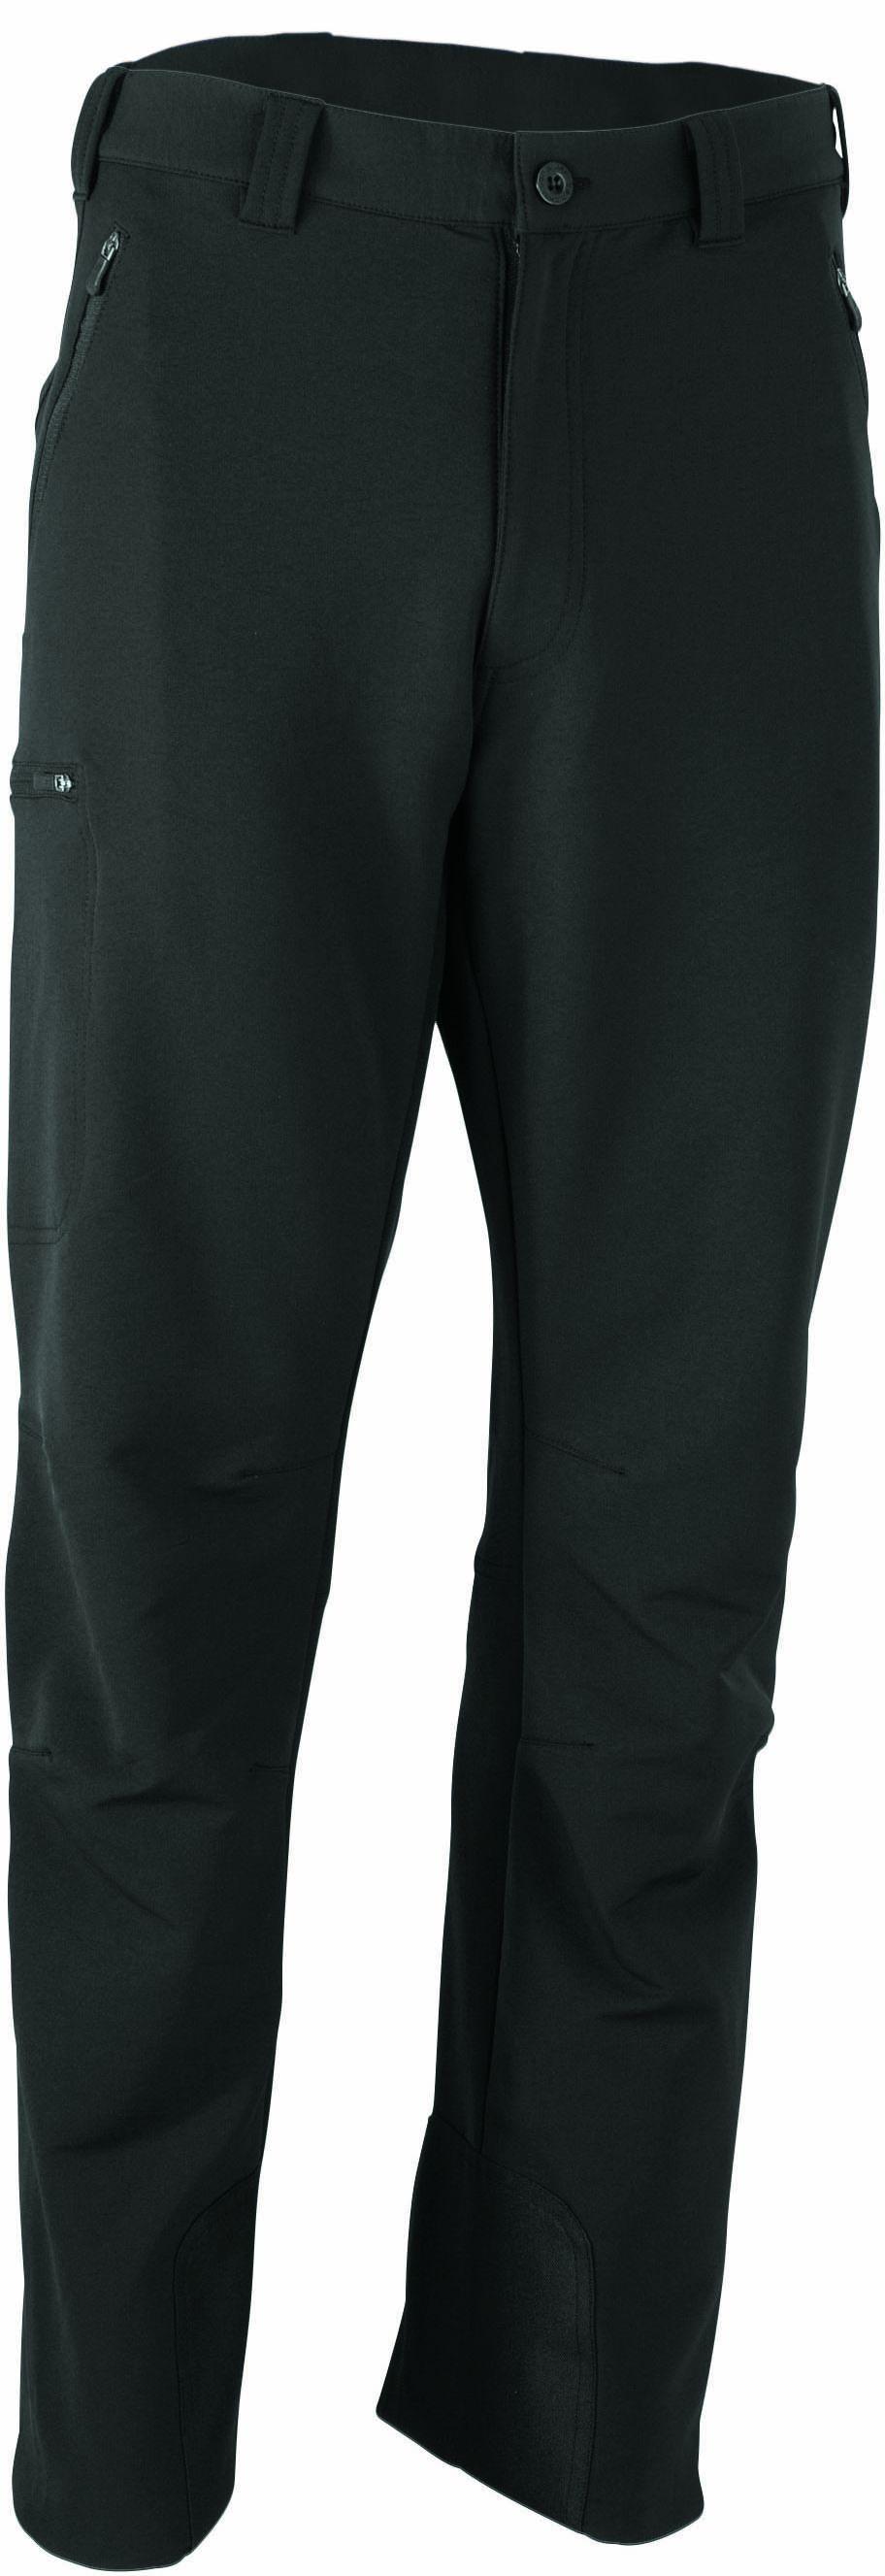 Stretchhose, einfach zu Shorts abzippbar